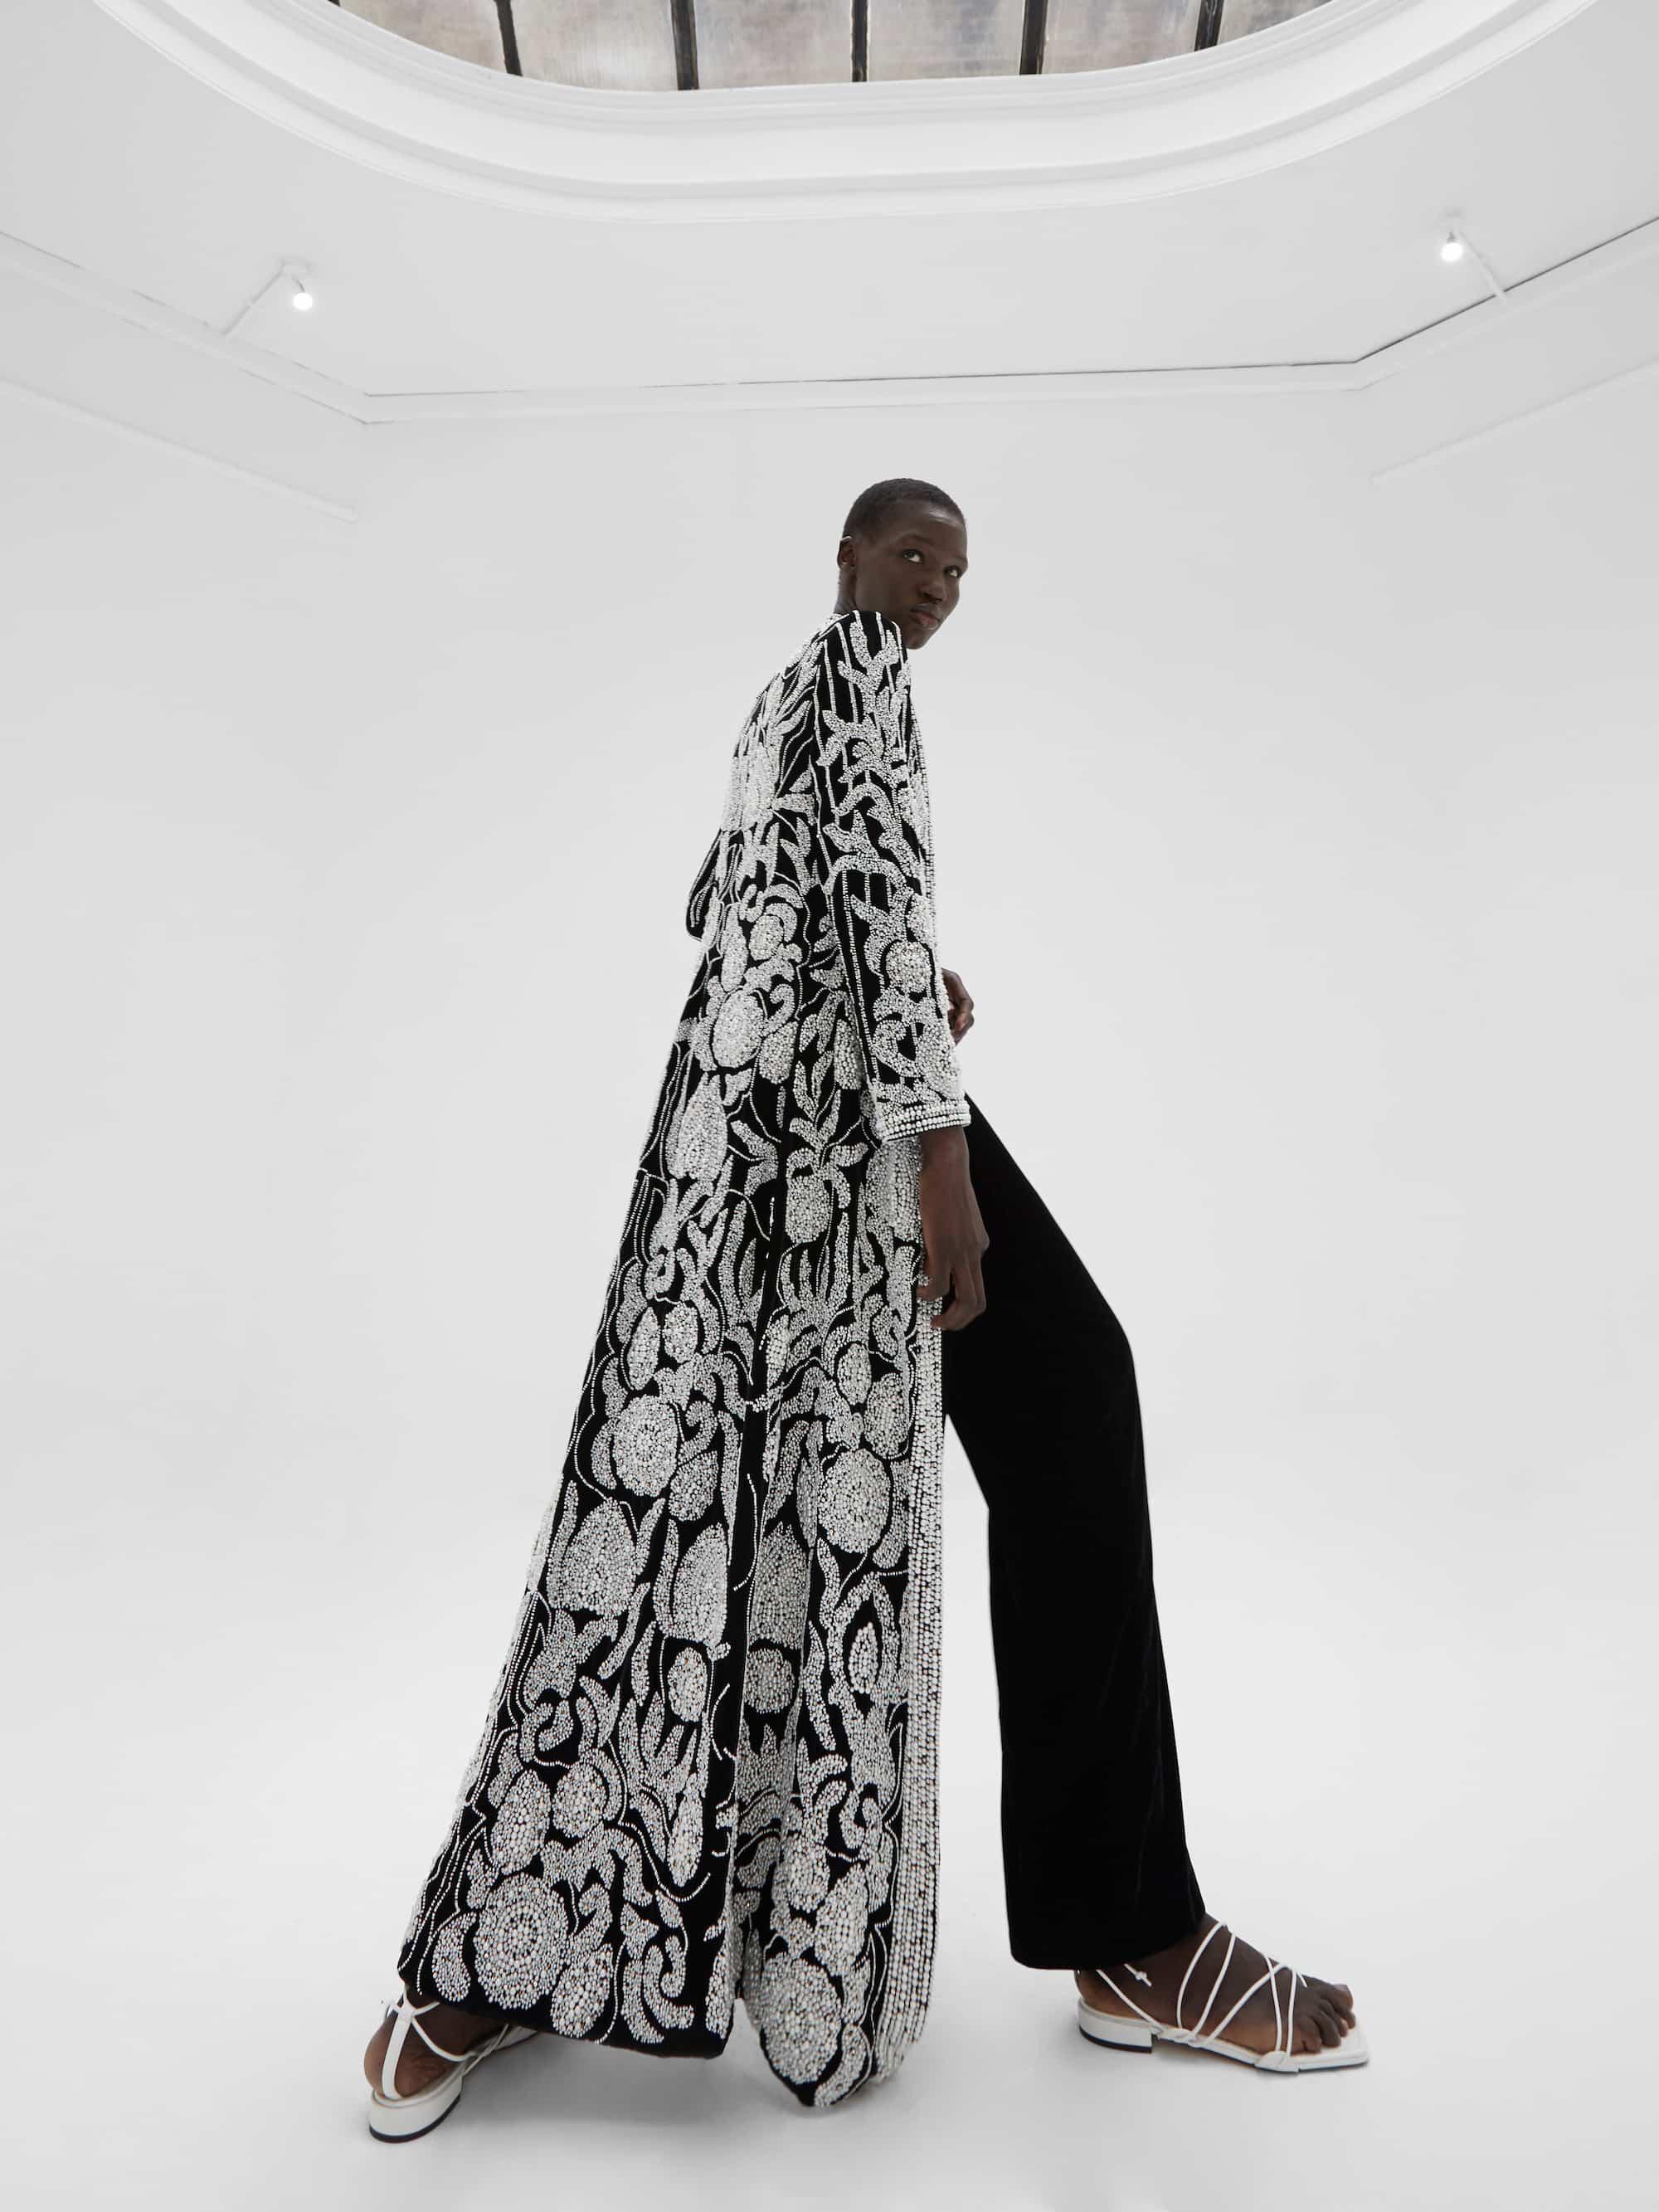 View 4 of model wearing Khaira Kimono in black.